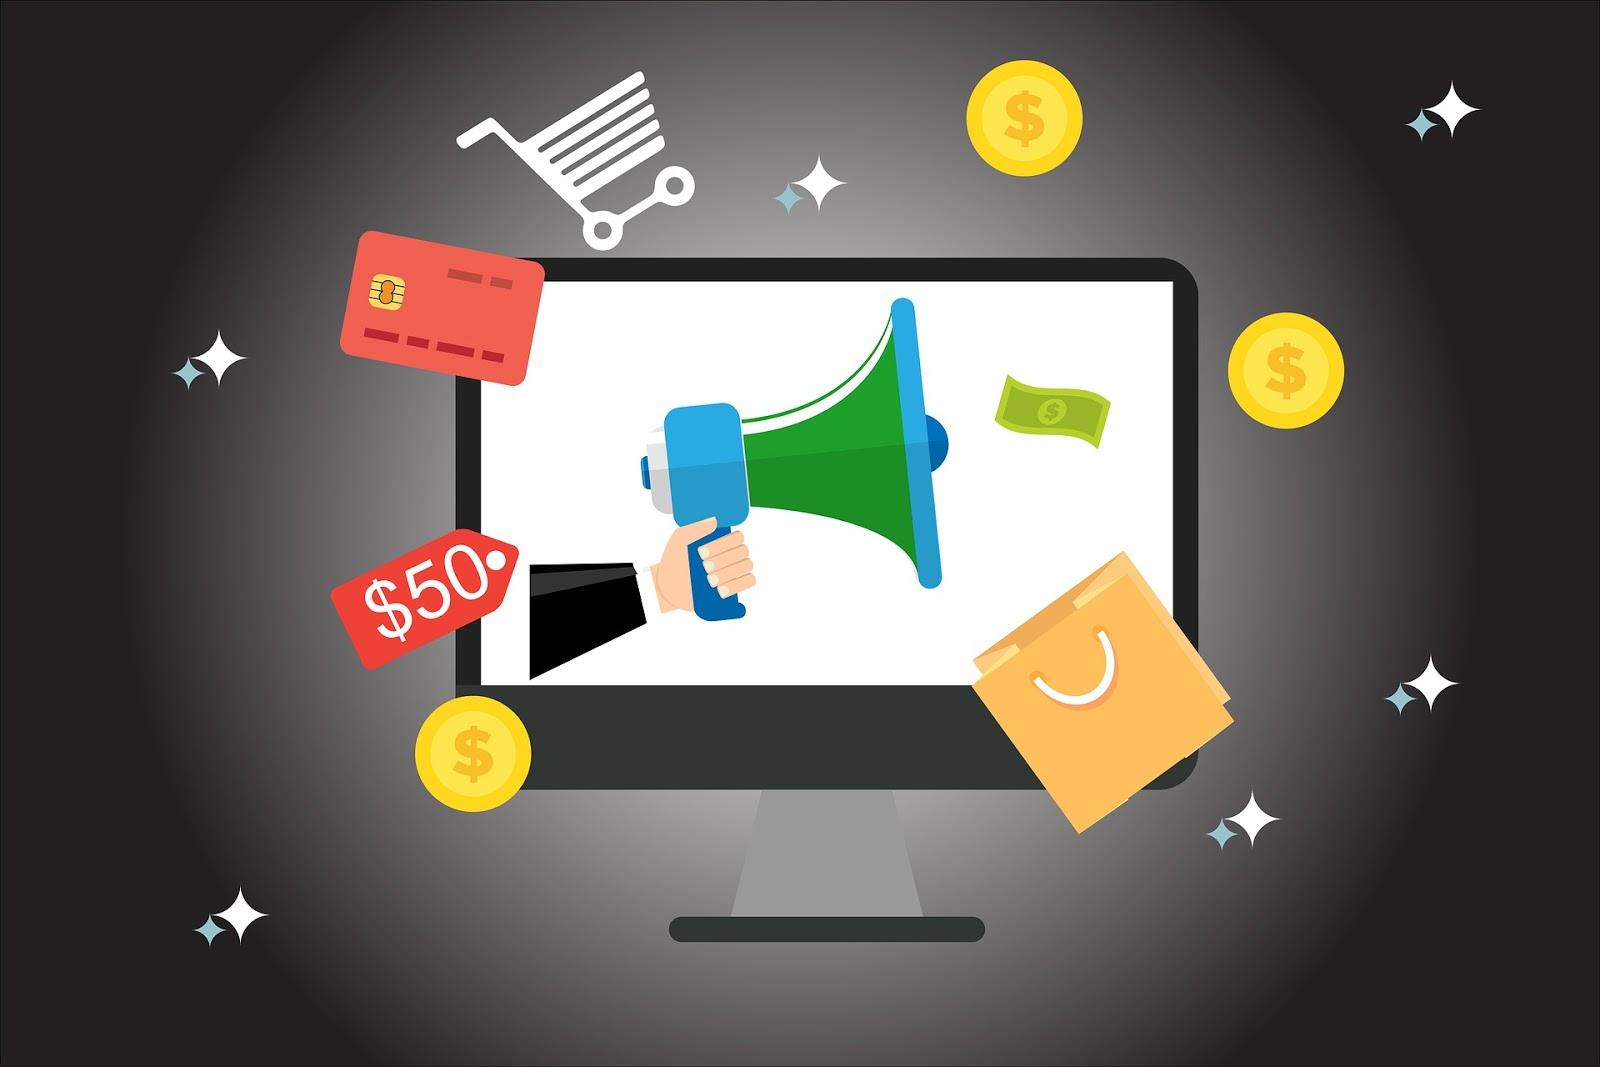 Cara Blogger Mendapatkan Uang dari Blognya